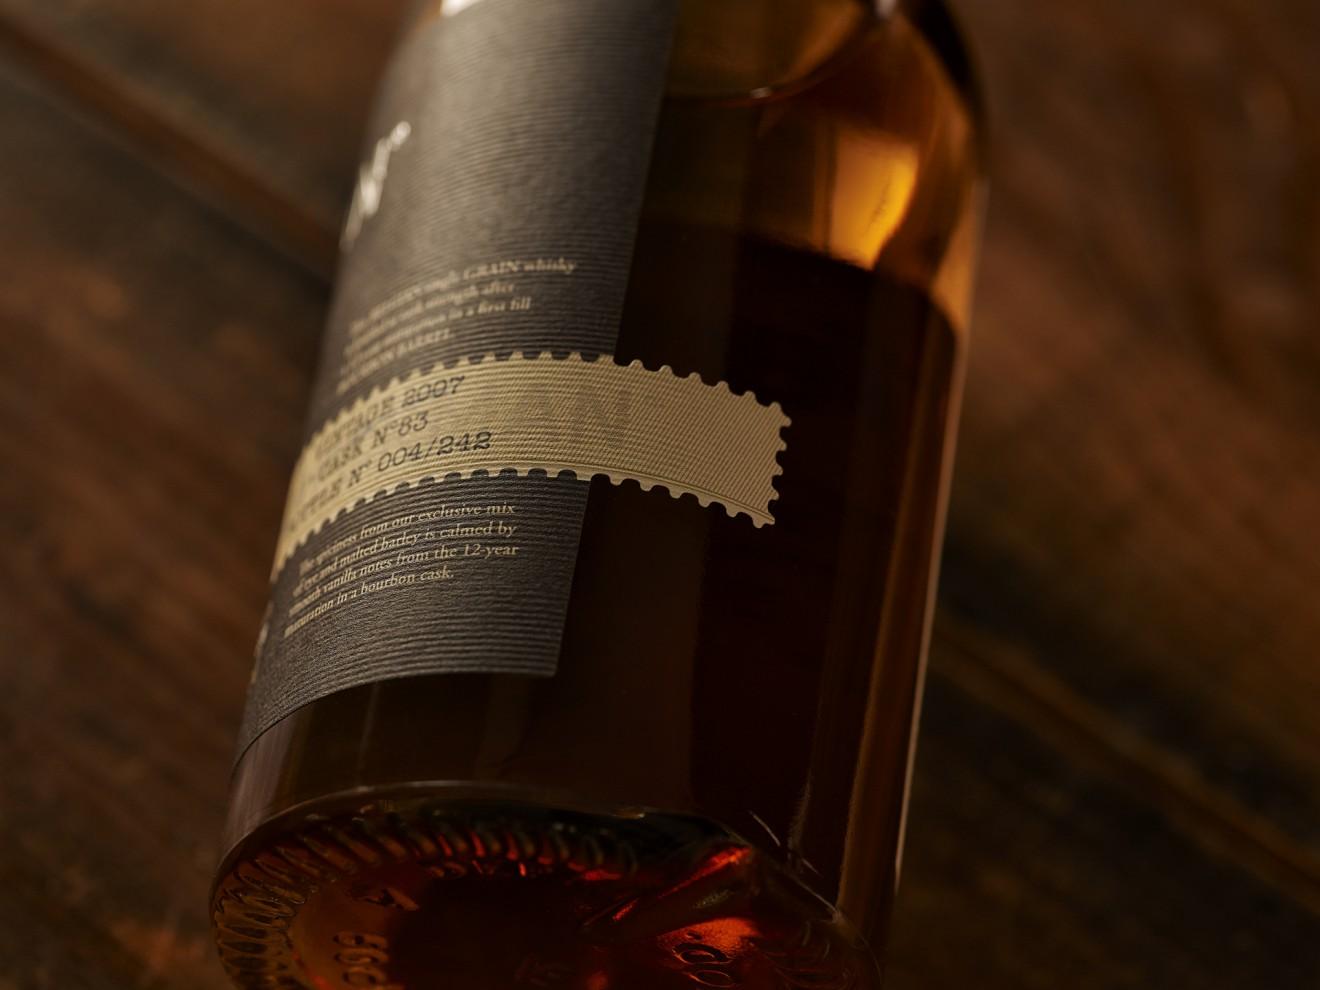 Quatre Mains package design - packaging, design, detailing